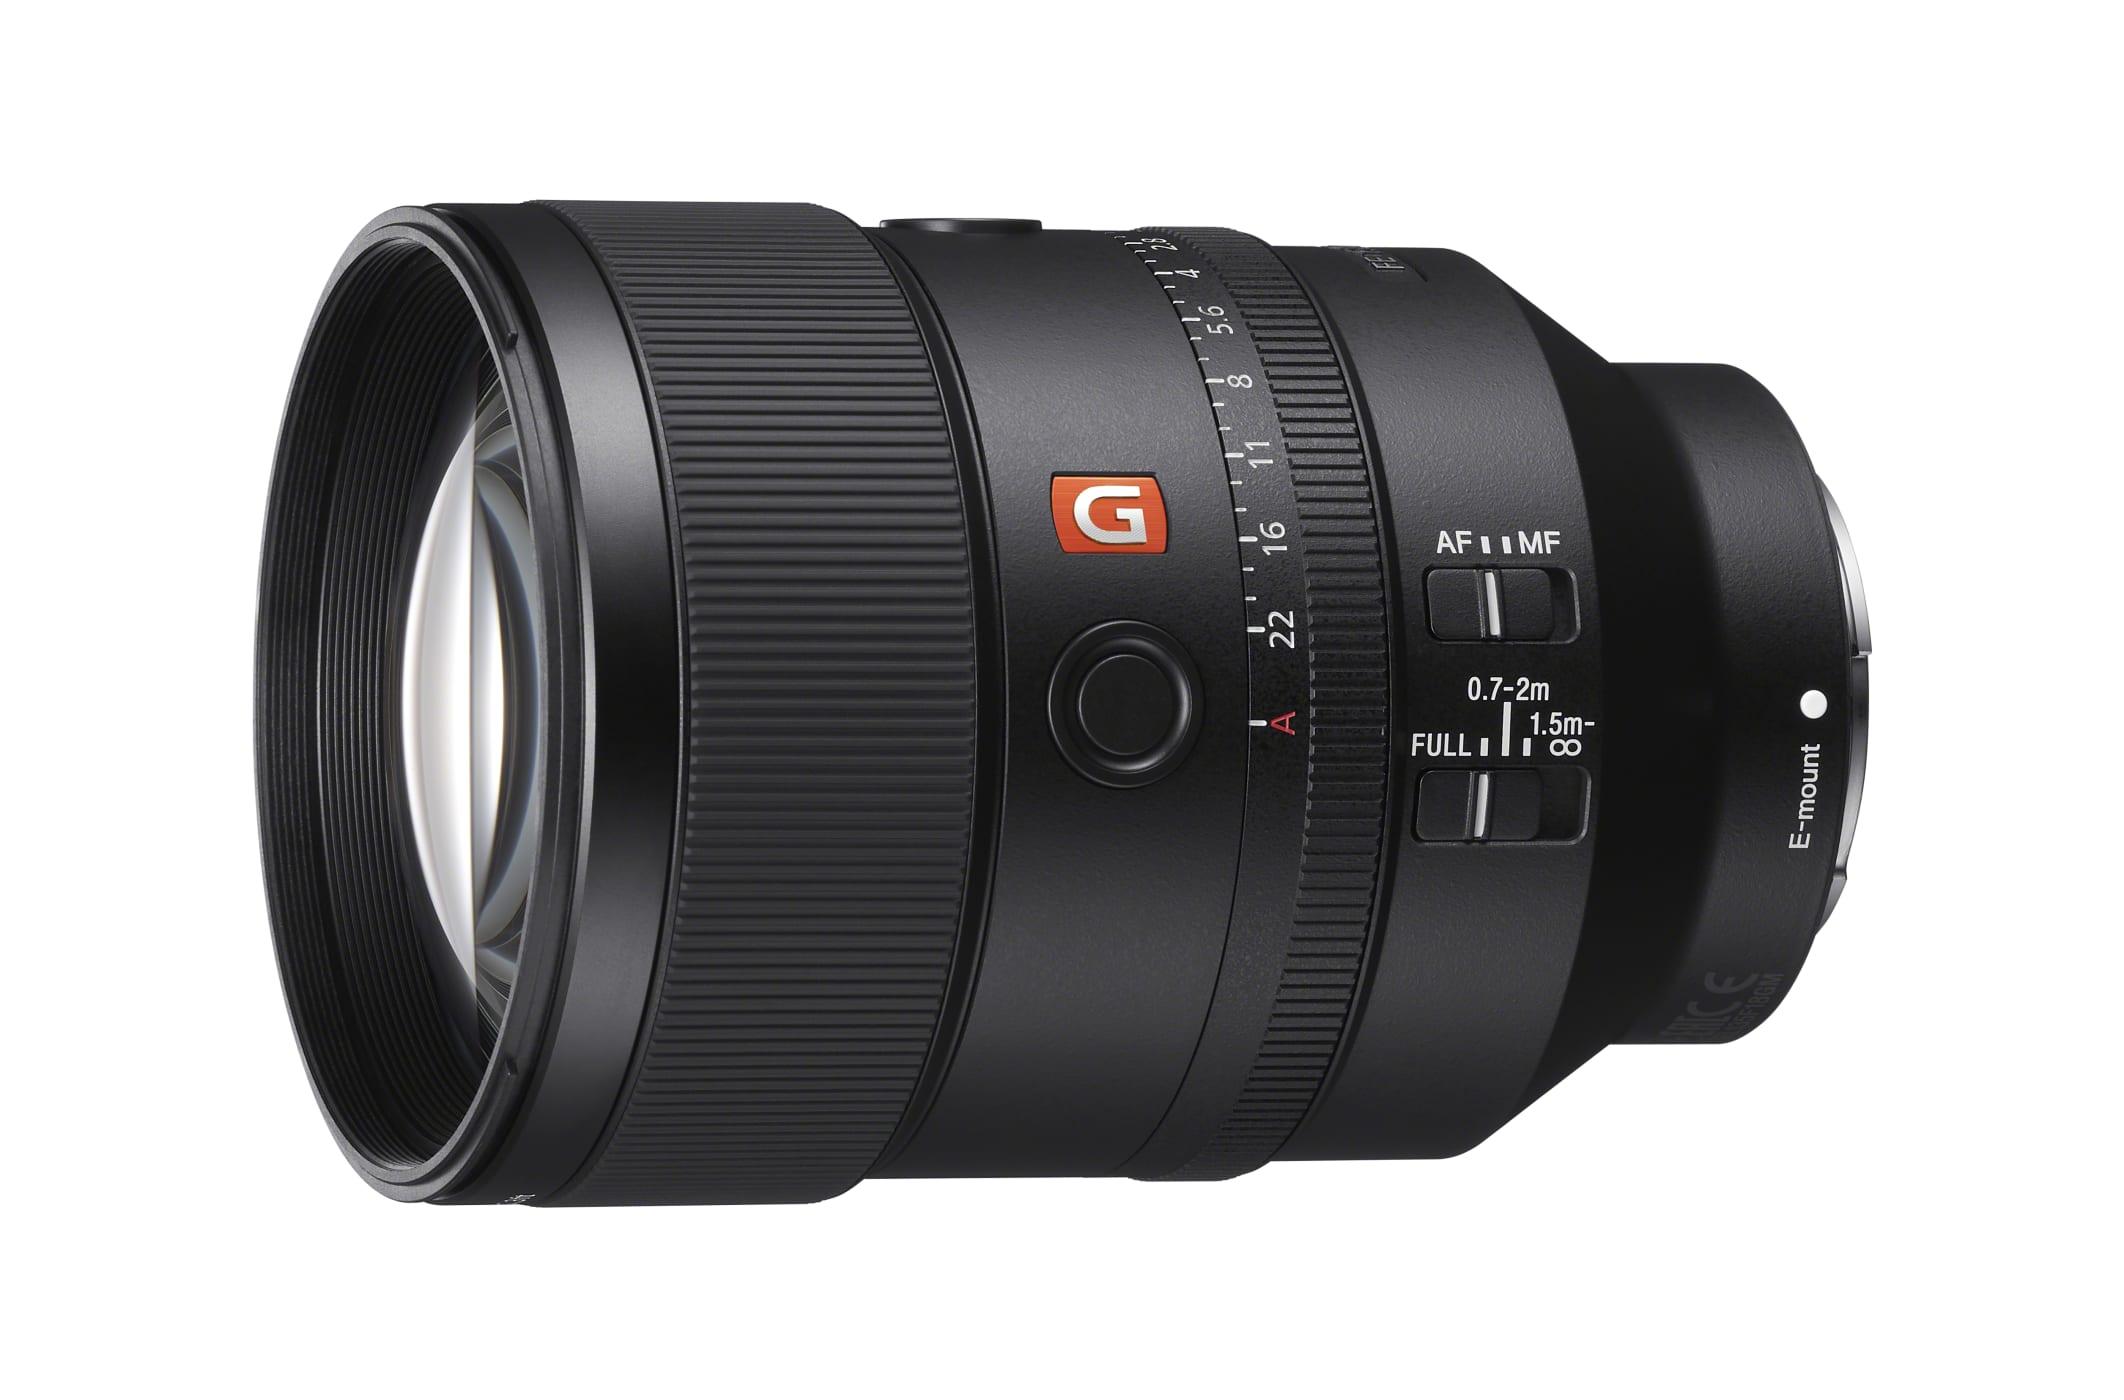 SEL-135F18GM: Sony bringt Vollformatobjektiv mit 135 mm und f/1,8 - Sony SEL-135F18GM (Bild: Sony)